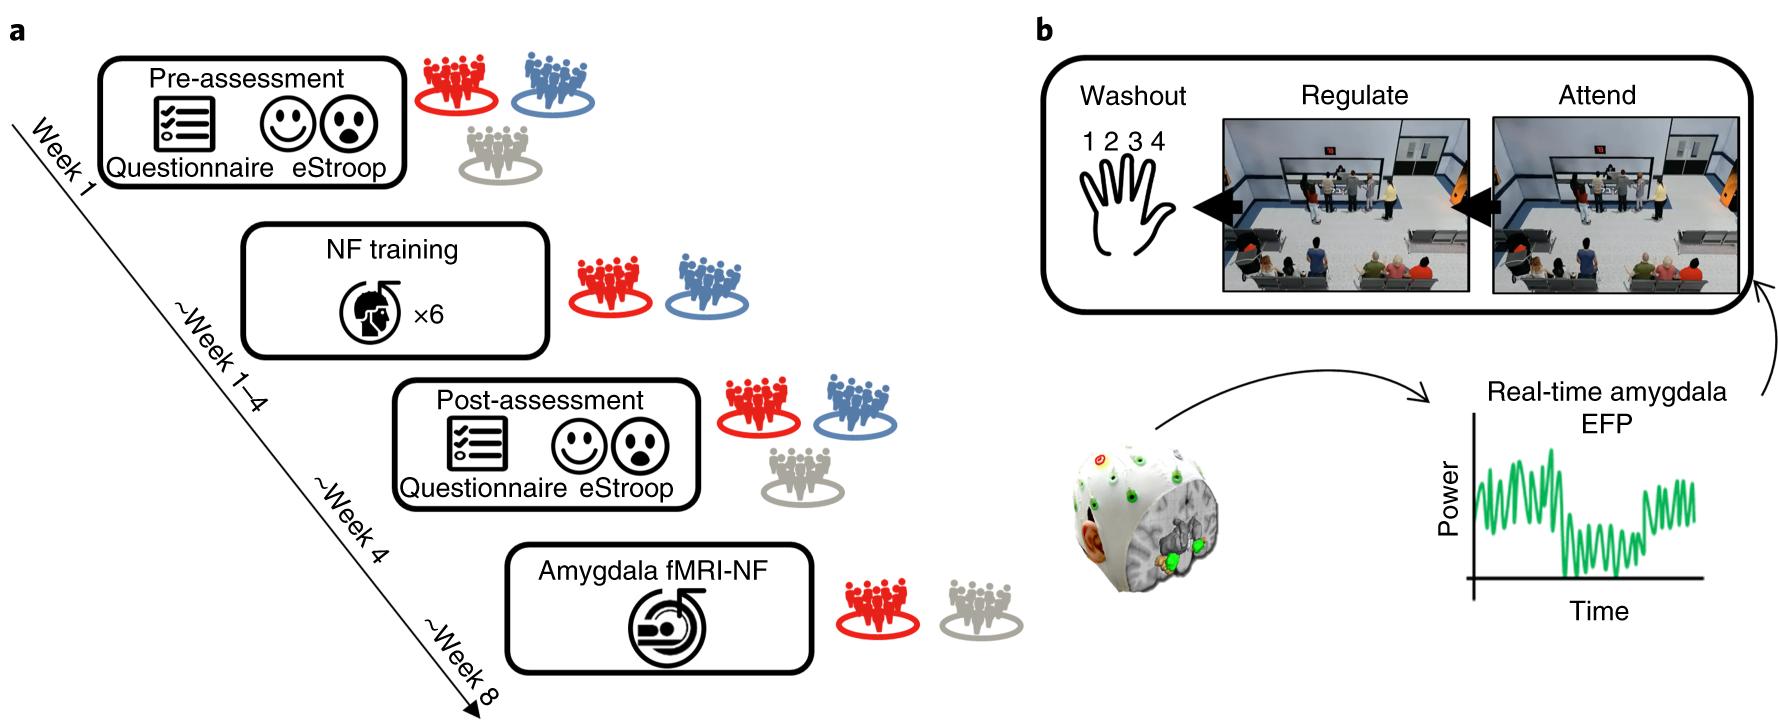 Electrical fingerprint of the amygdala guides neurofeedback